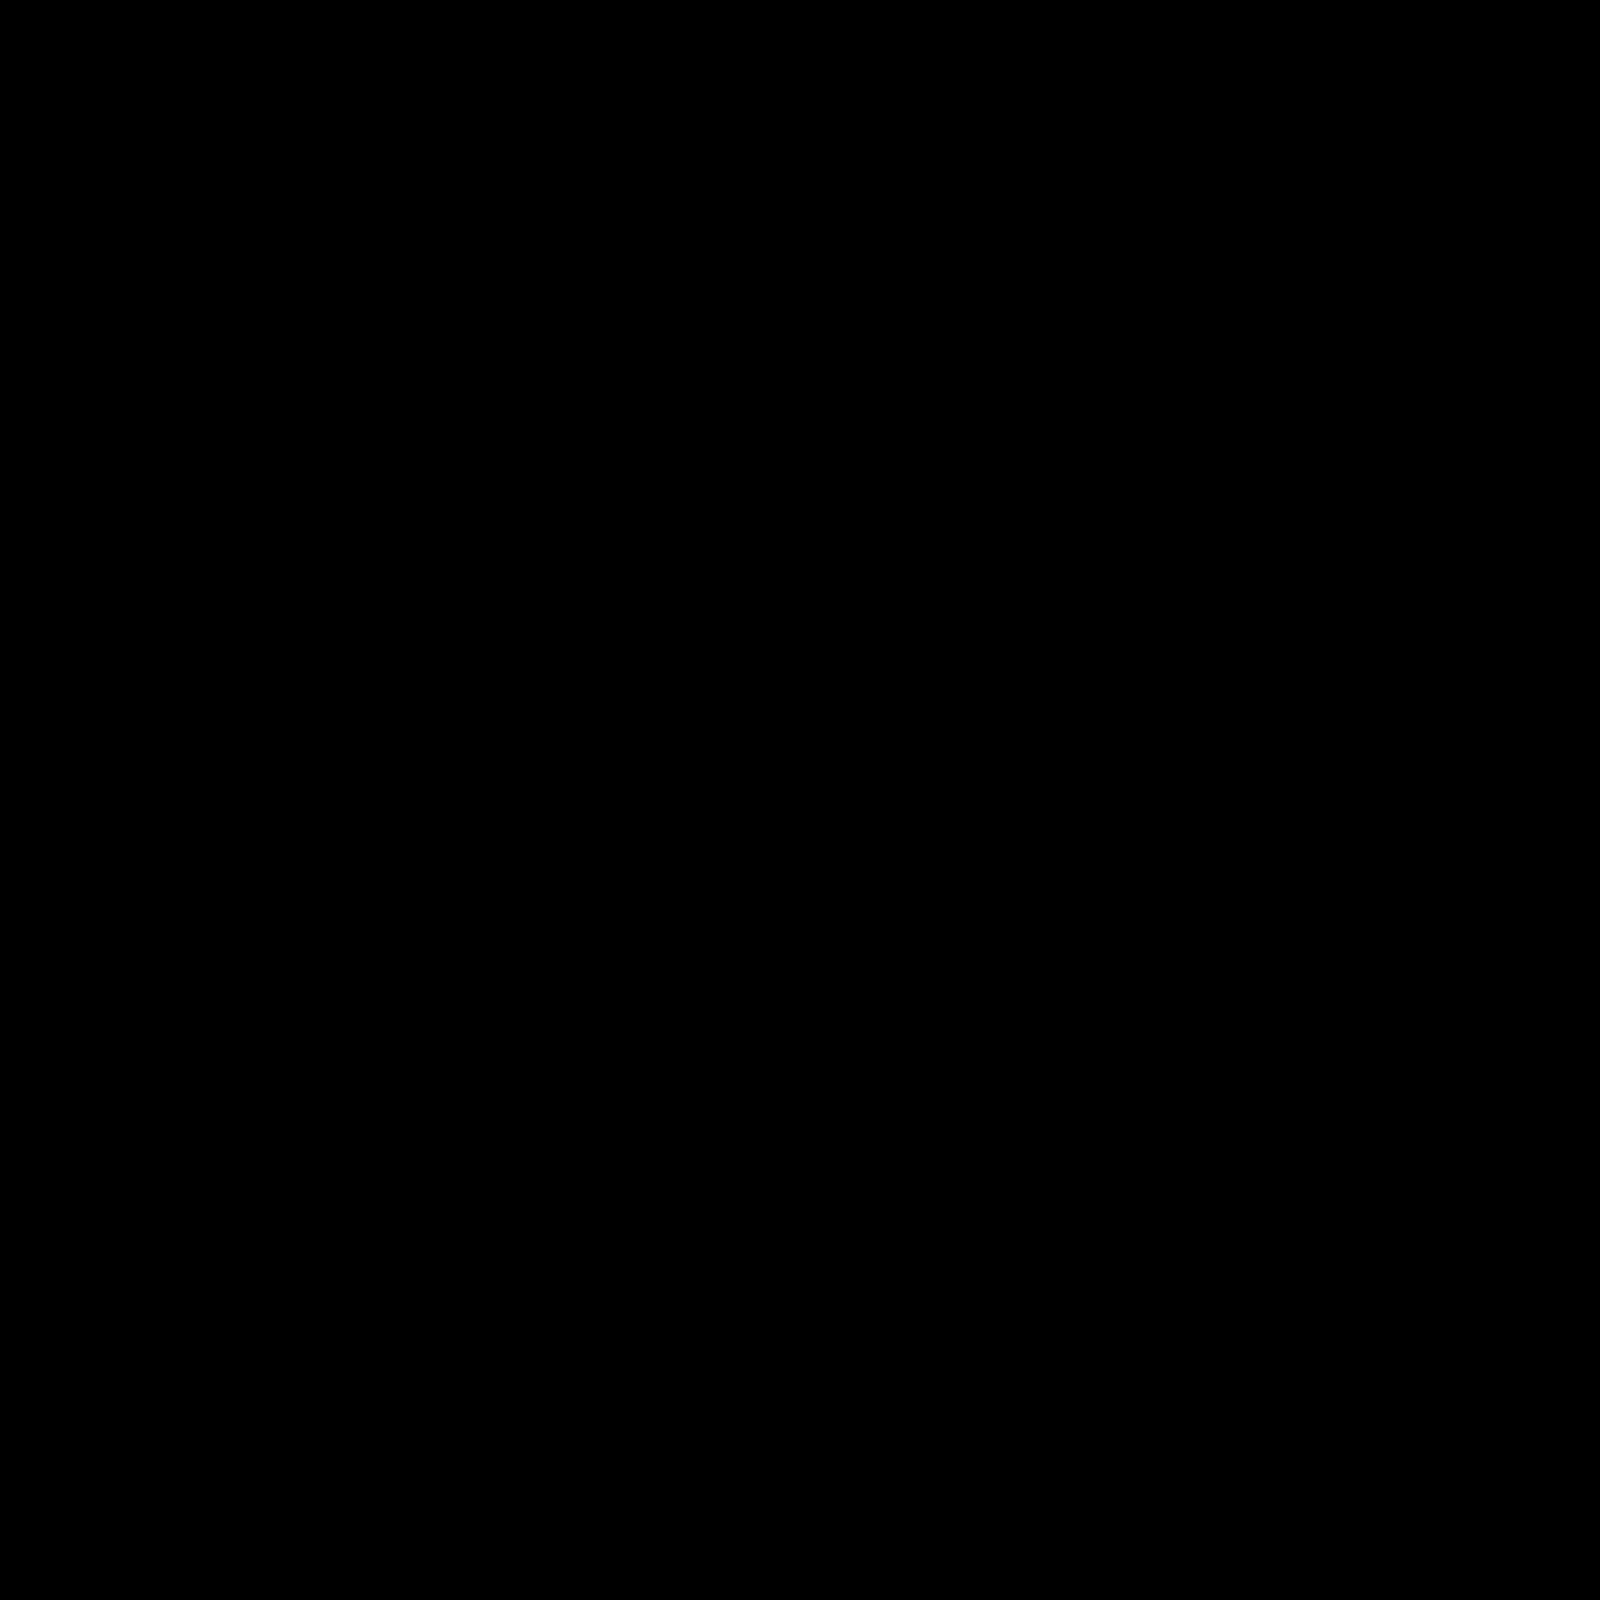 Lampy stołowe icon